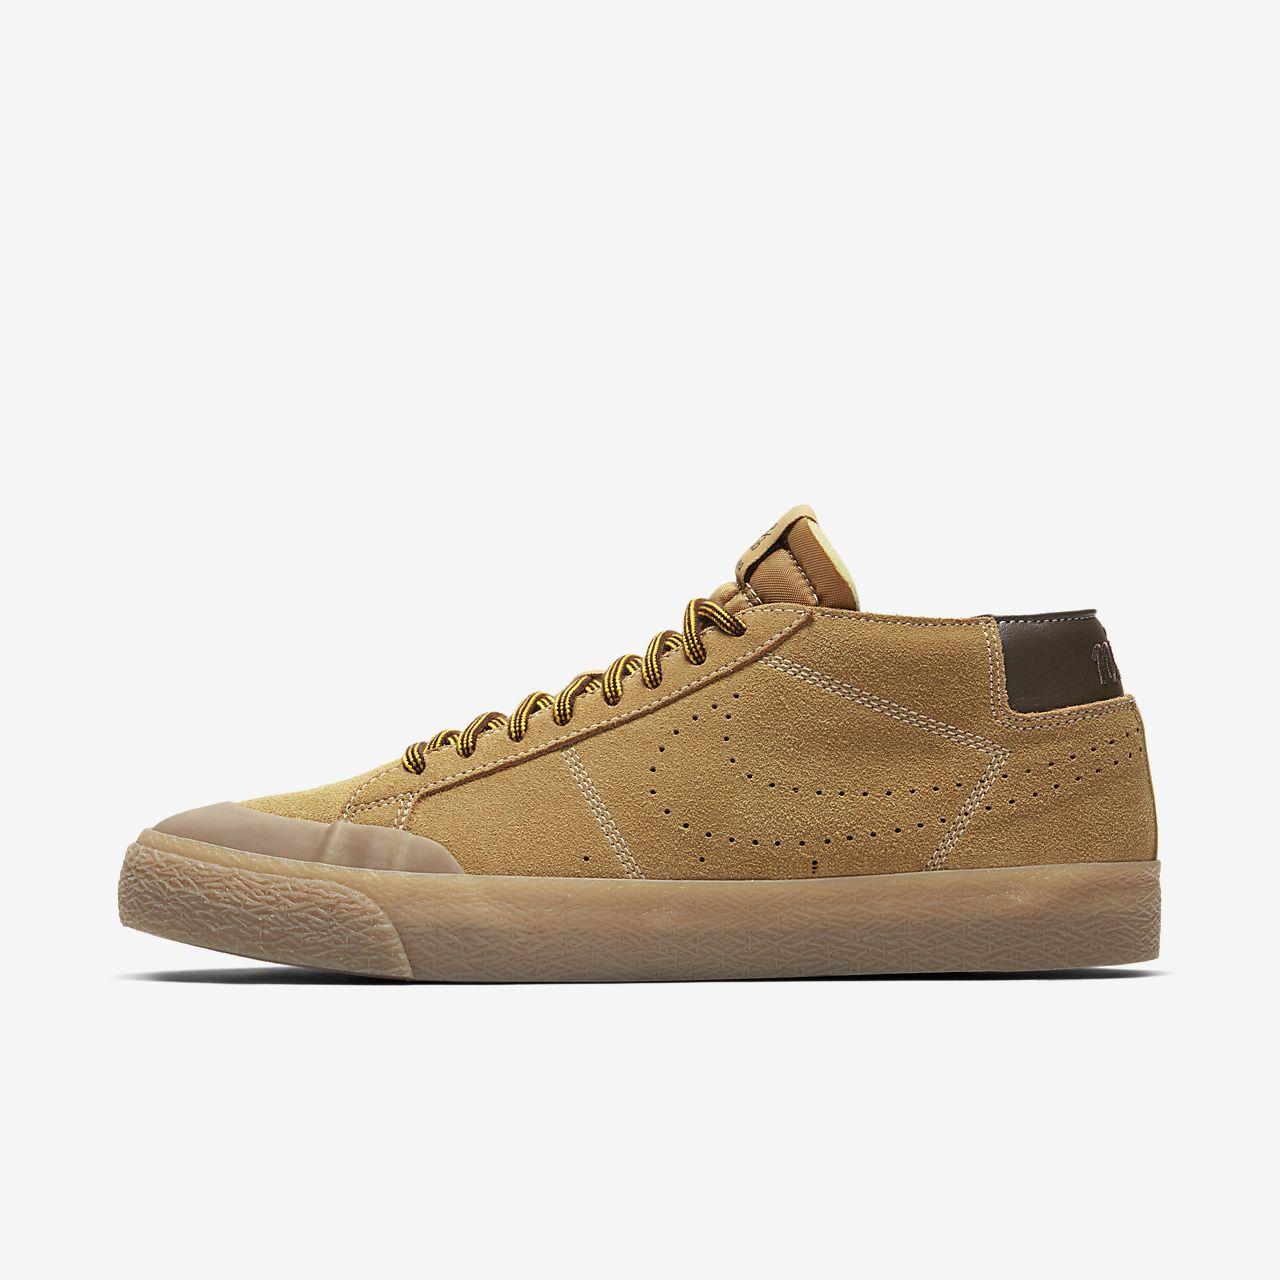 Nike SB Zoom Blazer Chukka XT Premium Skateboardschuh